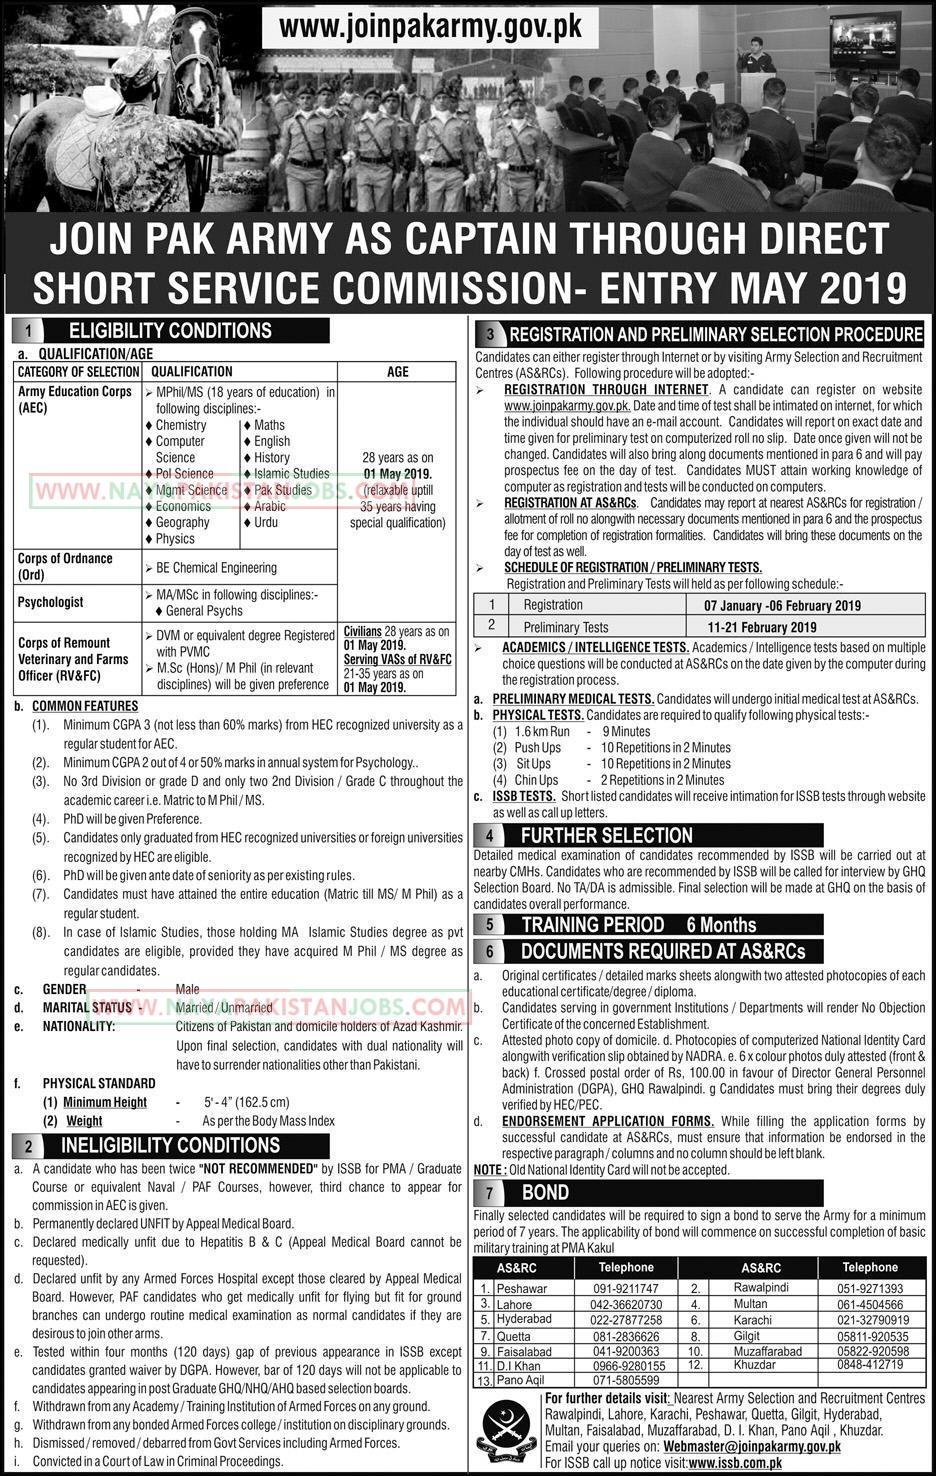 Pak Army jobs, join pak army, pak army captain jobs 2019, join pak army as captain, join pakistan army 2019